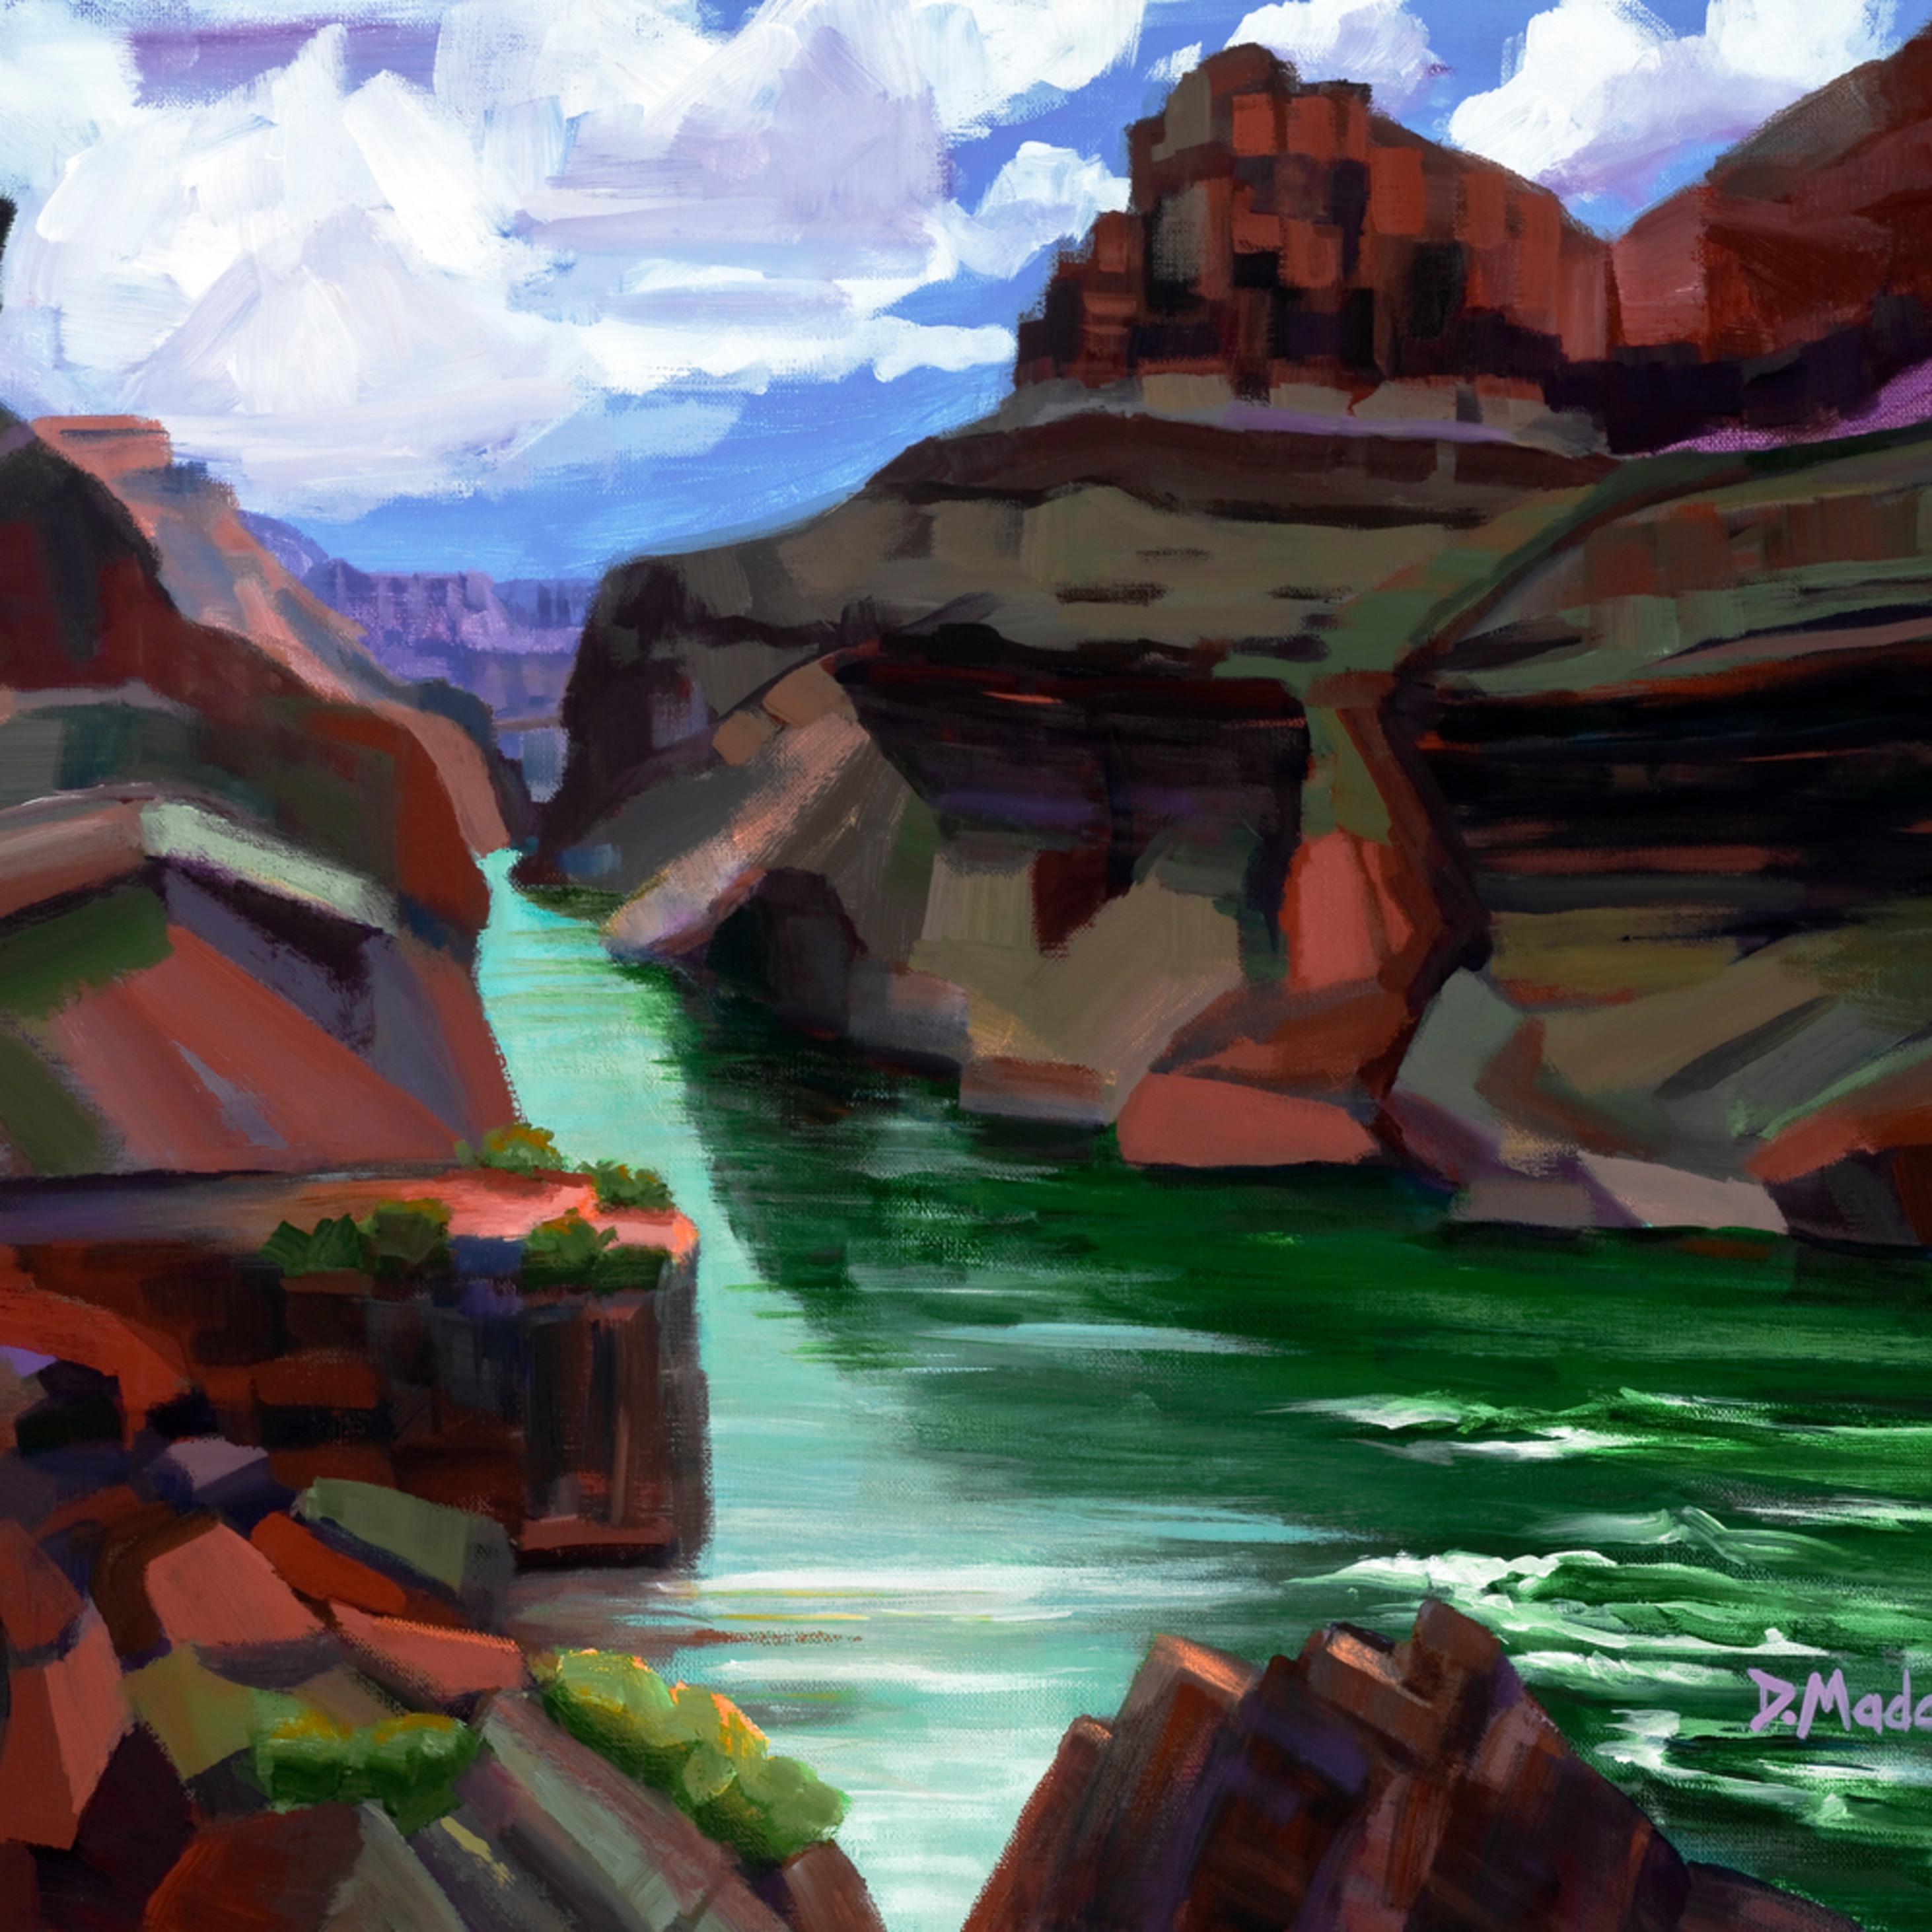 Trip down the grand canyon xxd qaijr4